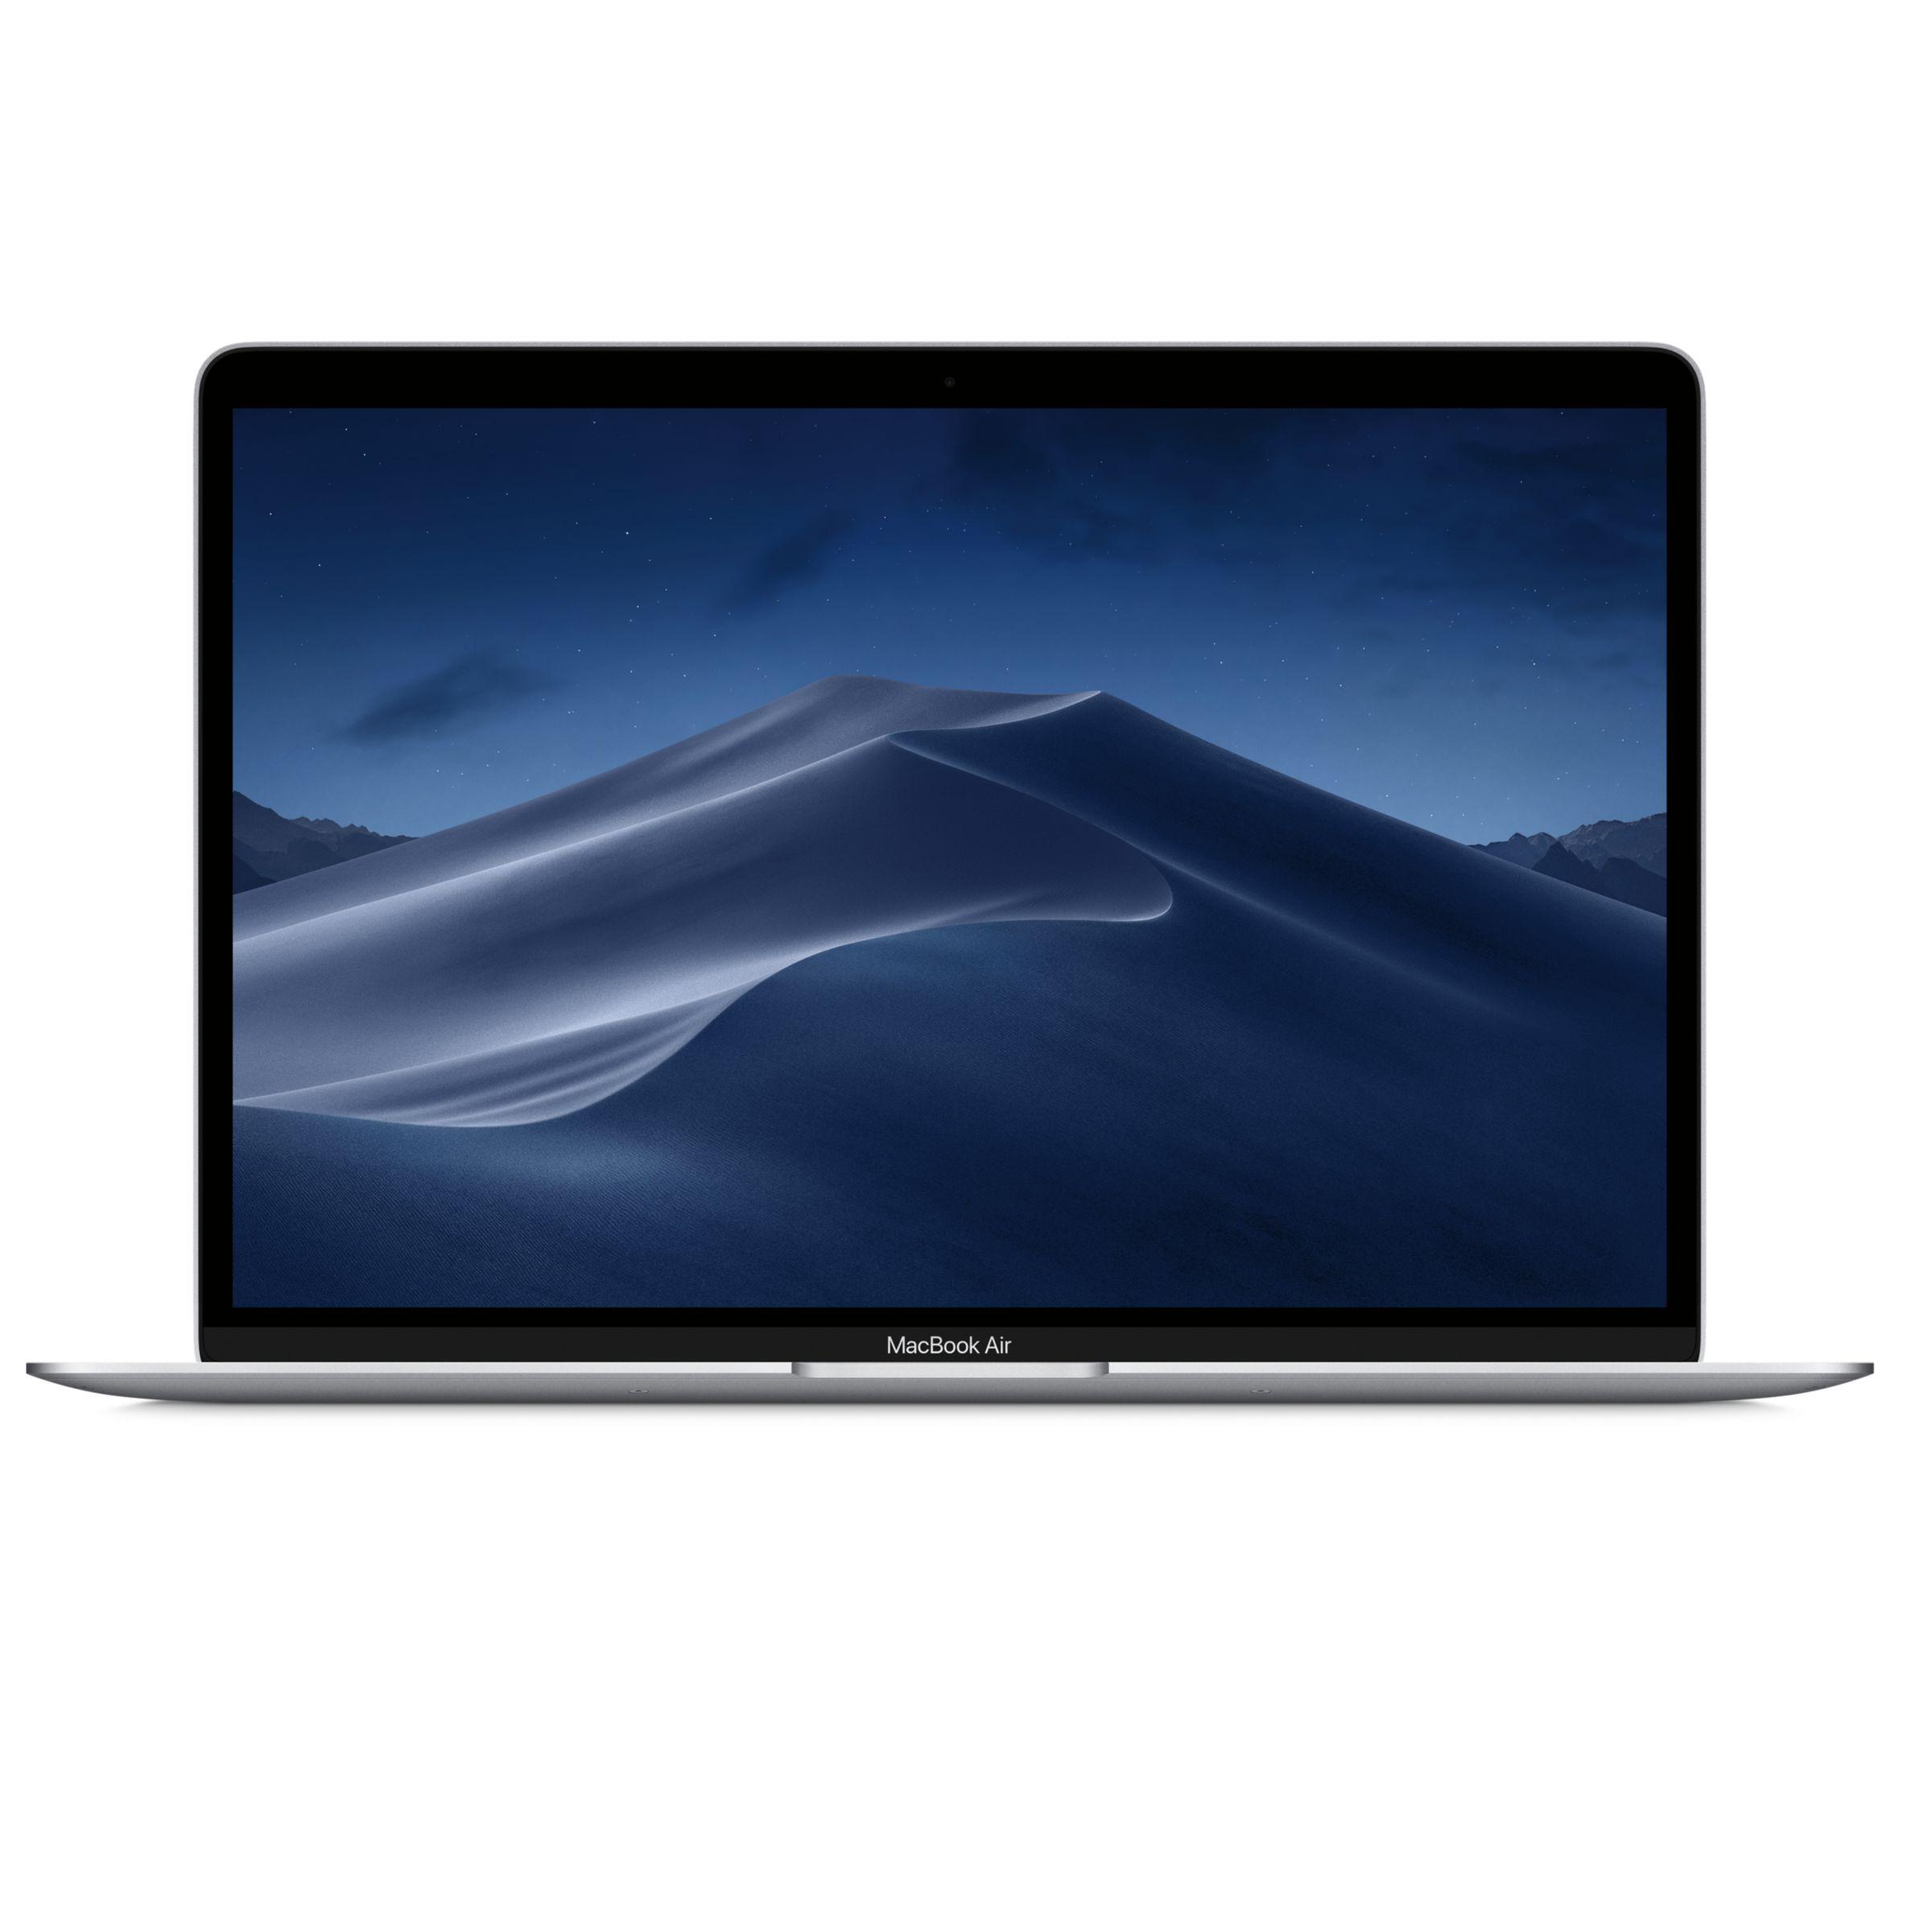 2019 Apple Macbook Air 13 3 Retina Display Intel Core I5 8gb Ram 128gb Ssd Apple Macbook Pro Macbook Macbook Pro 15